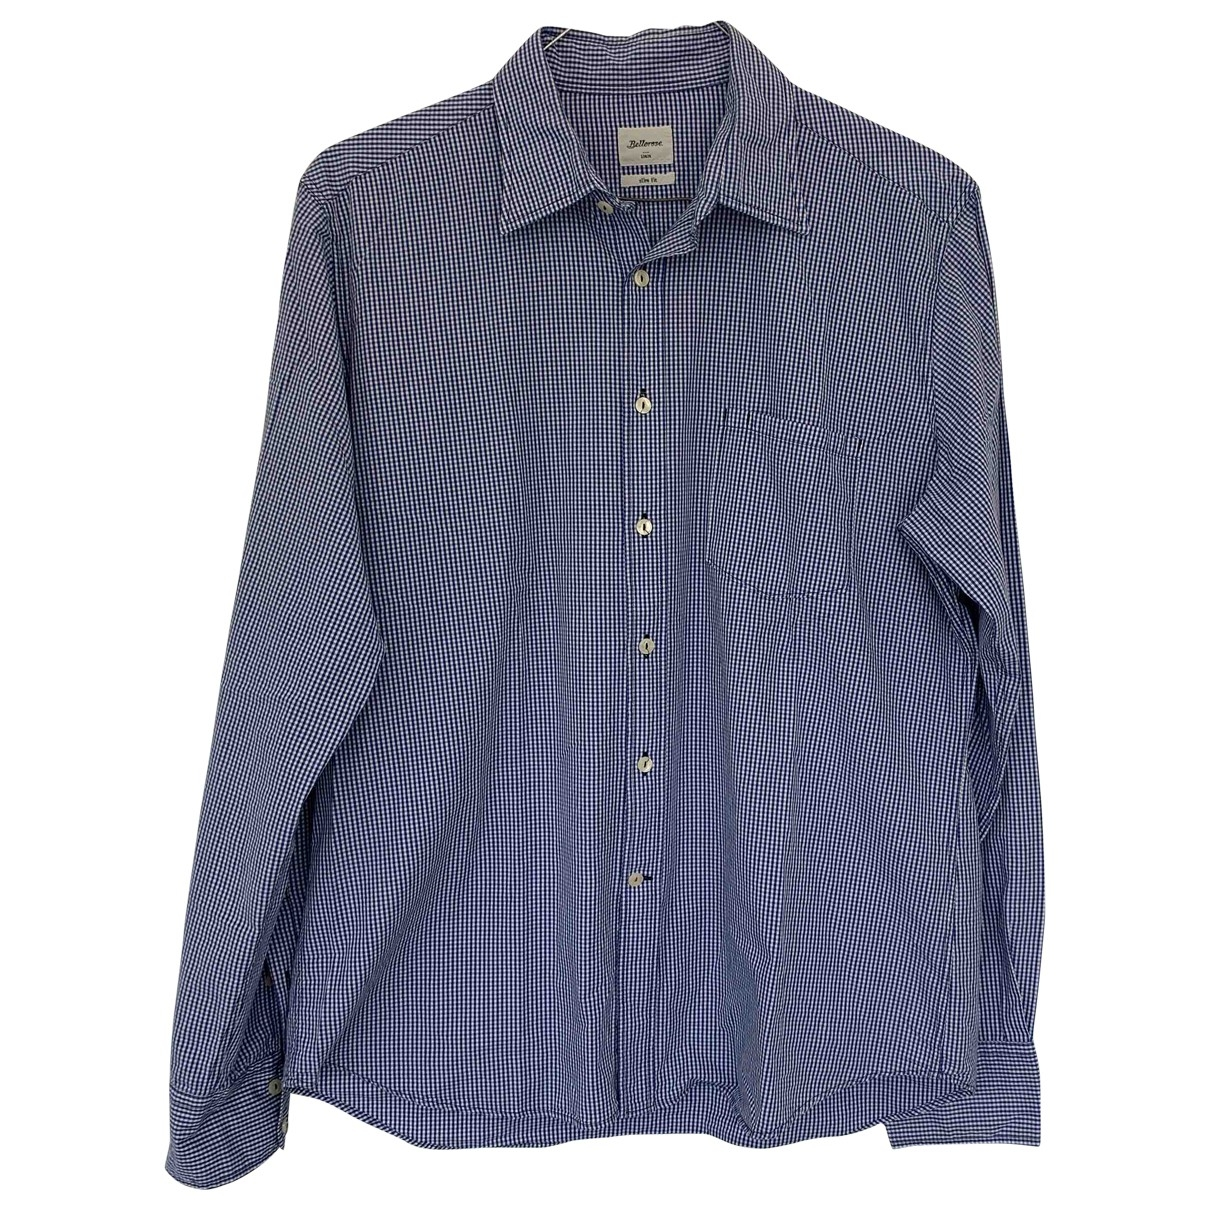 Bellerose \N Hemden in  Blau Baumwolle